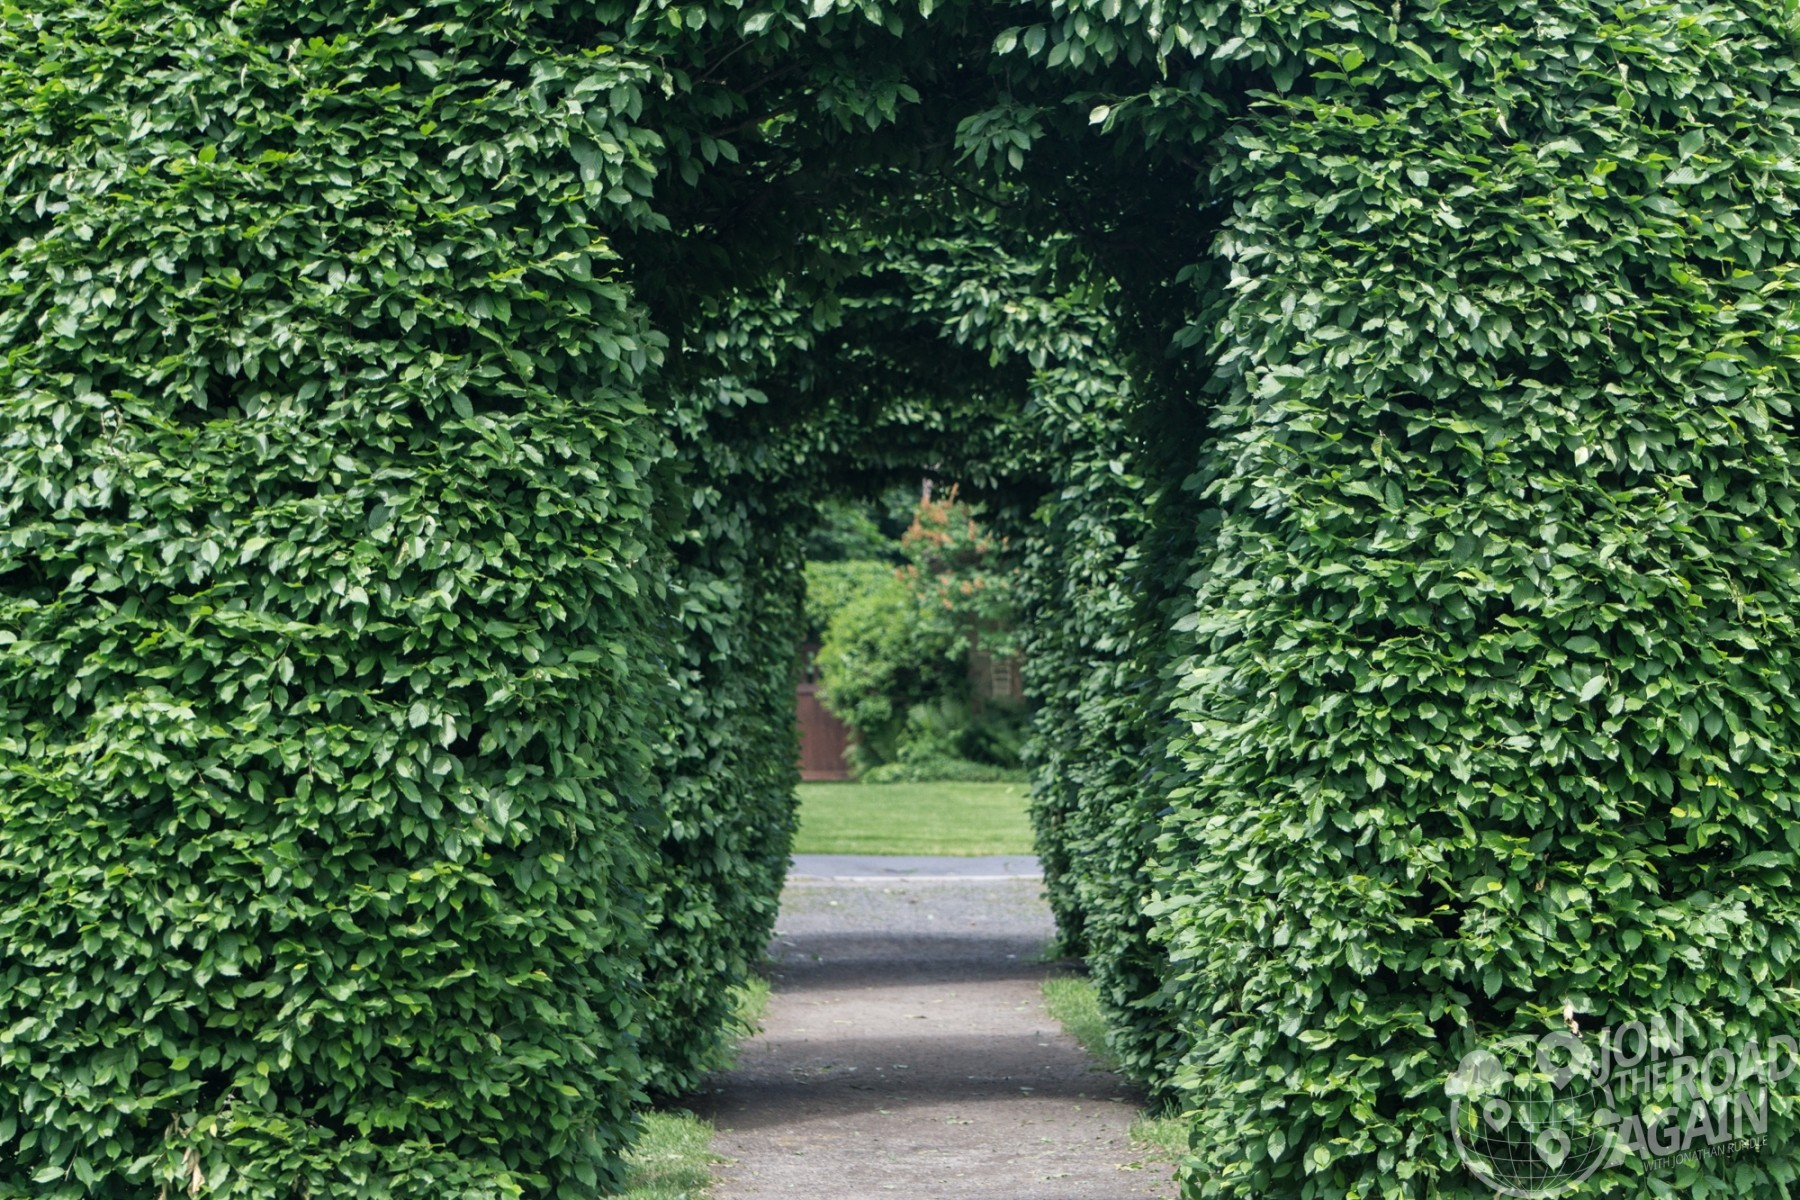 Duncan Garden at Manito Park, Spokane, WA